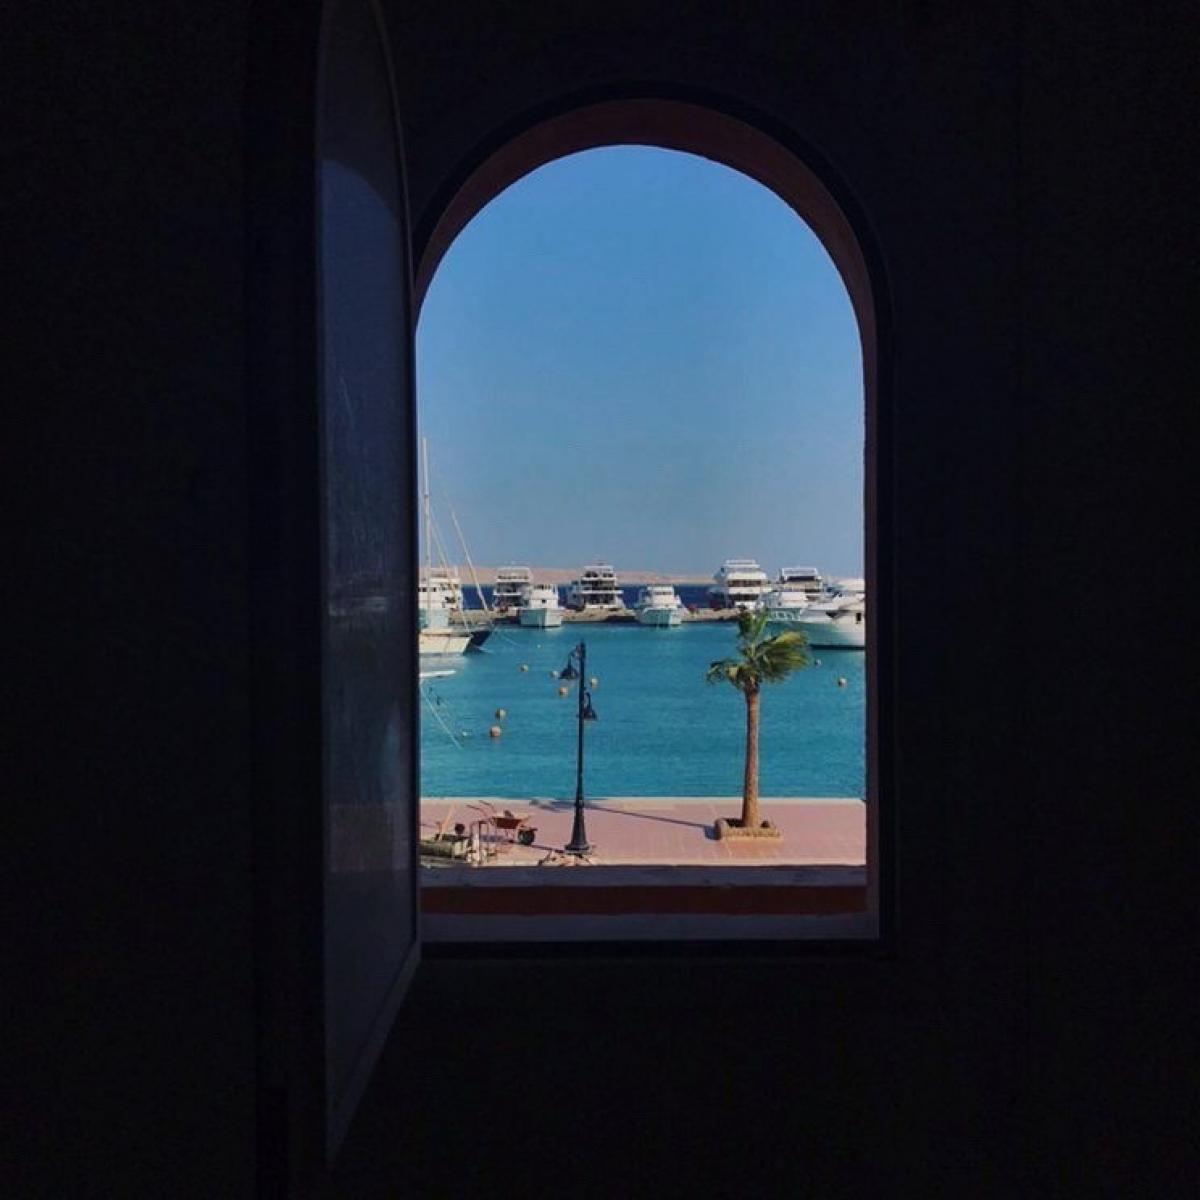 Khung cửa sổ tại New Marina, Hurghada, Ai Cập. Nguồn: windowswap